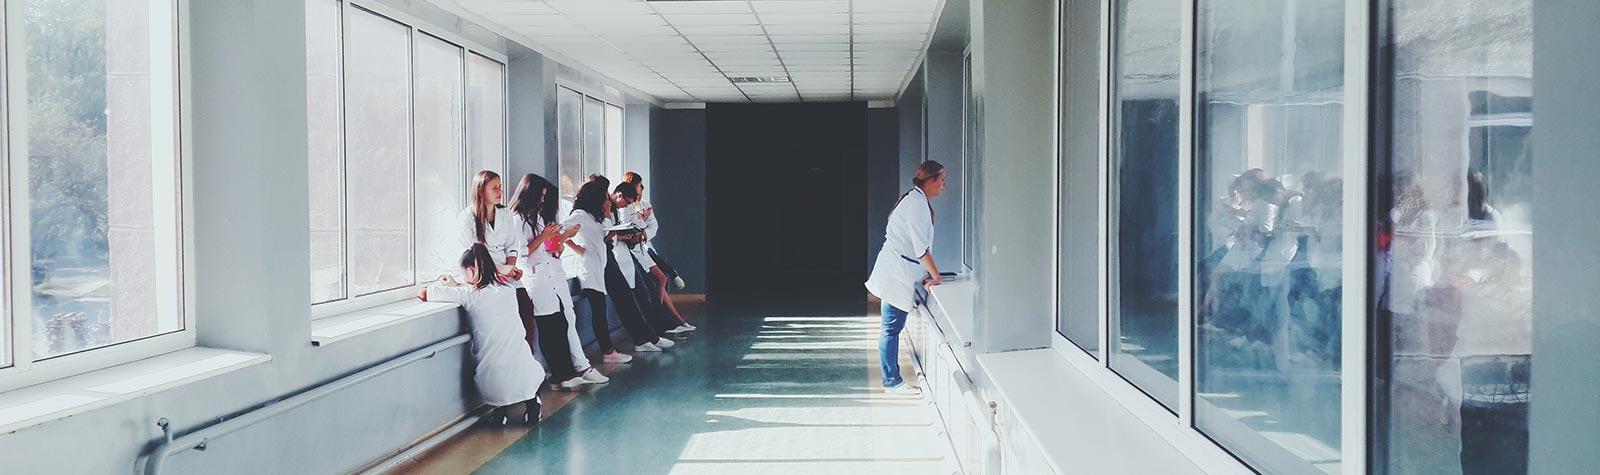 Hospital Construction: Renovating pre-existing buildings